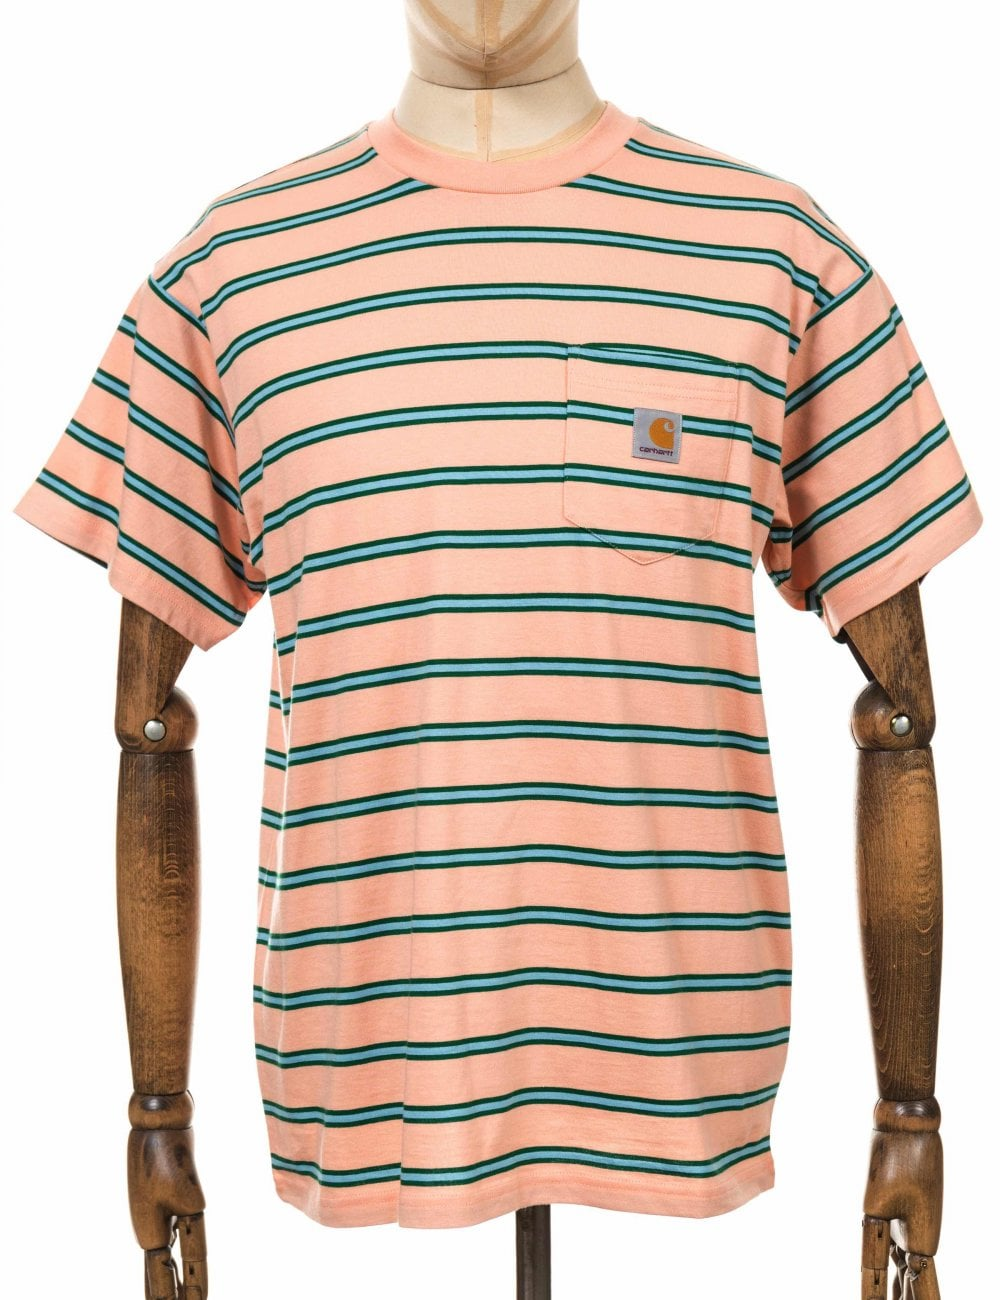 82d01ed30261 Carhartt WIP Houston Stripe Pocket Tee - Peach - Clothing from Fat ...